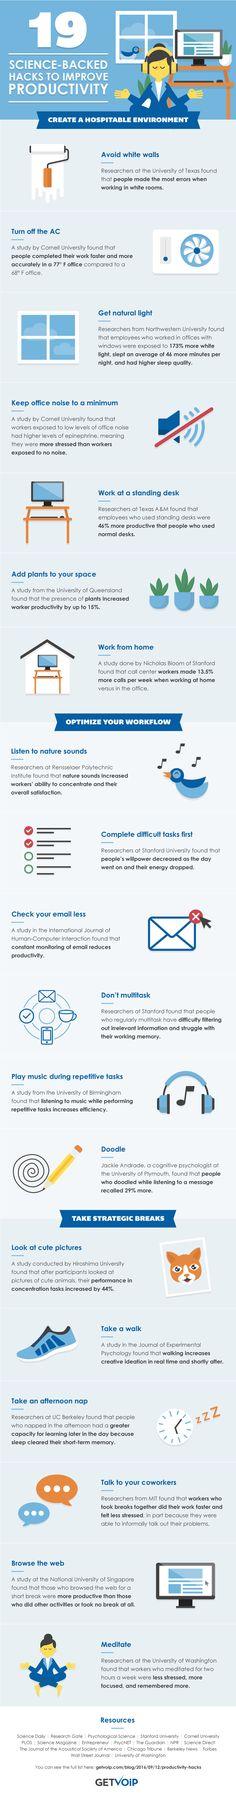 Infographic Productiviteit